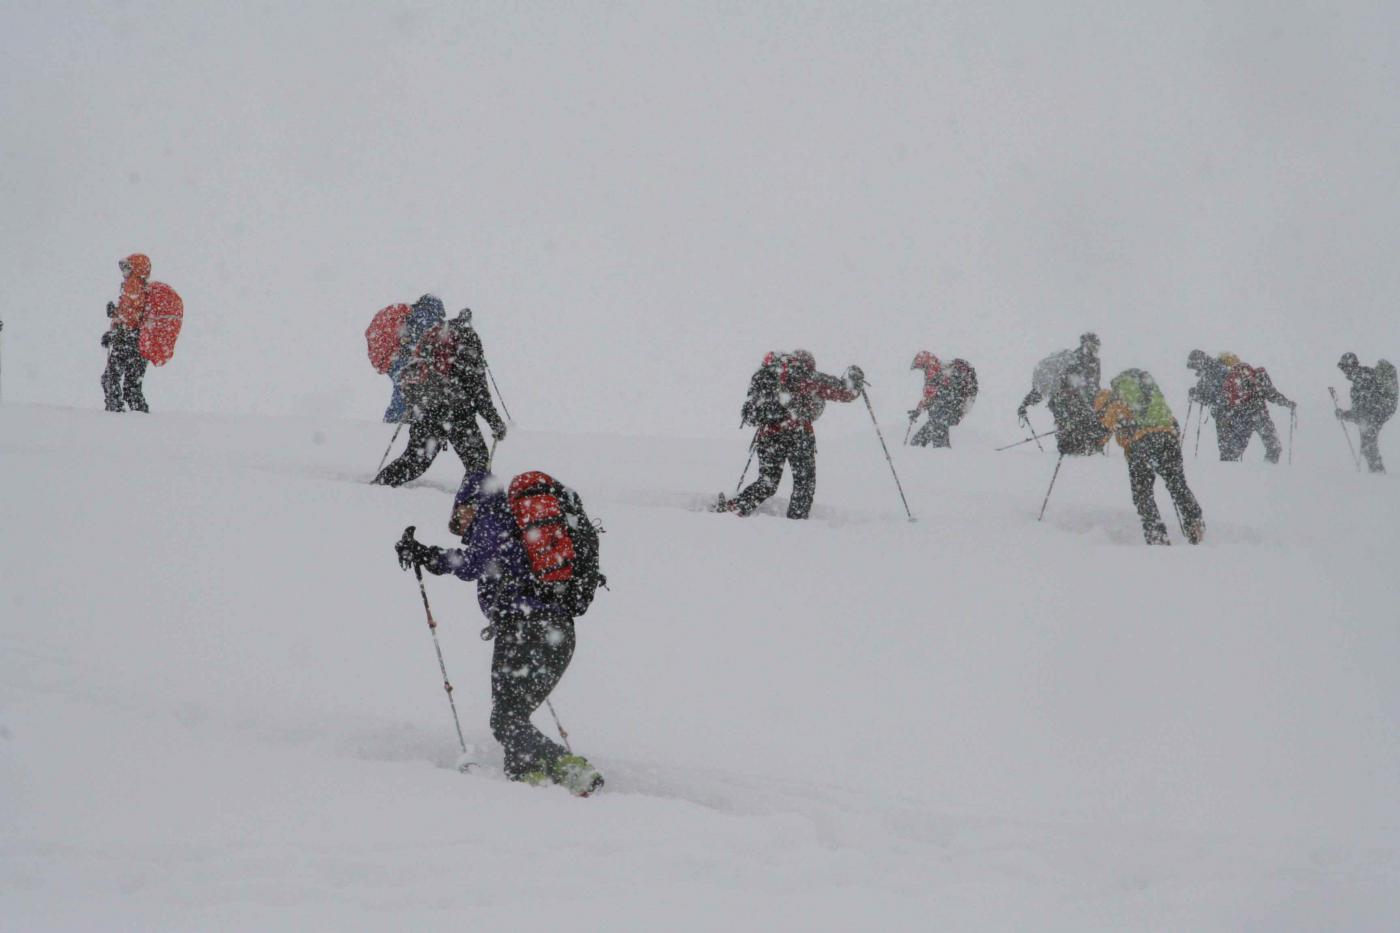 la salita, in piena nevicata